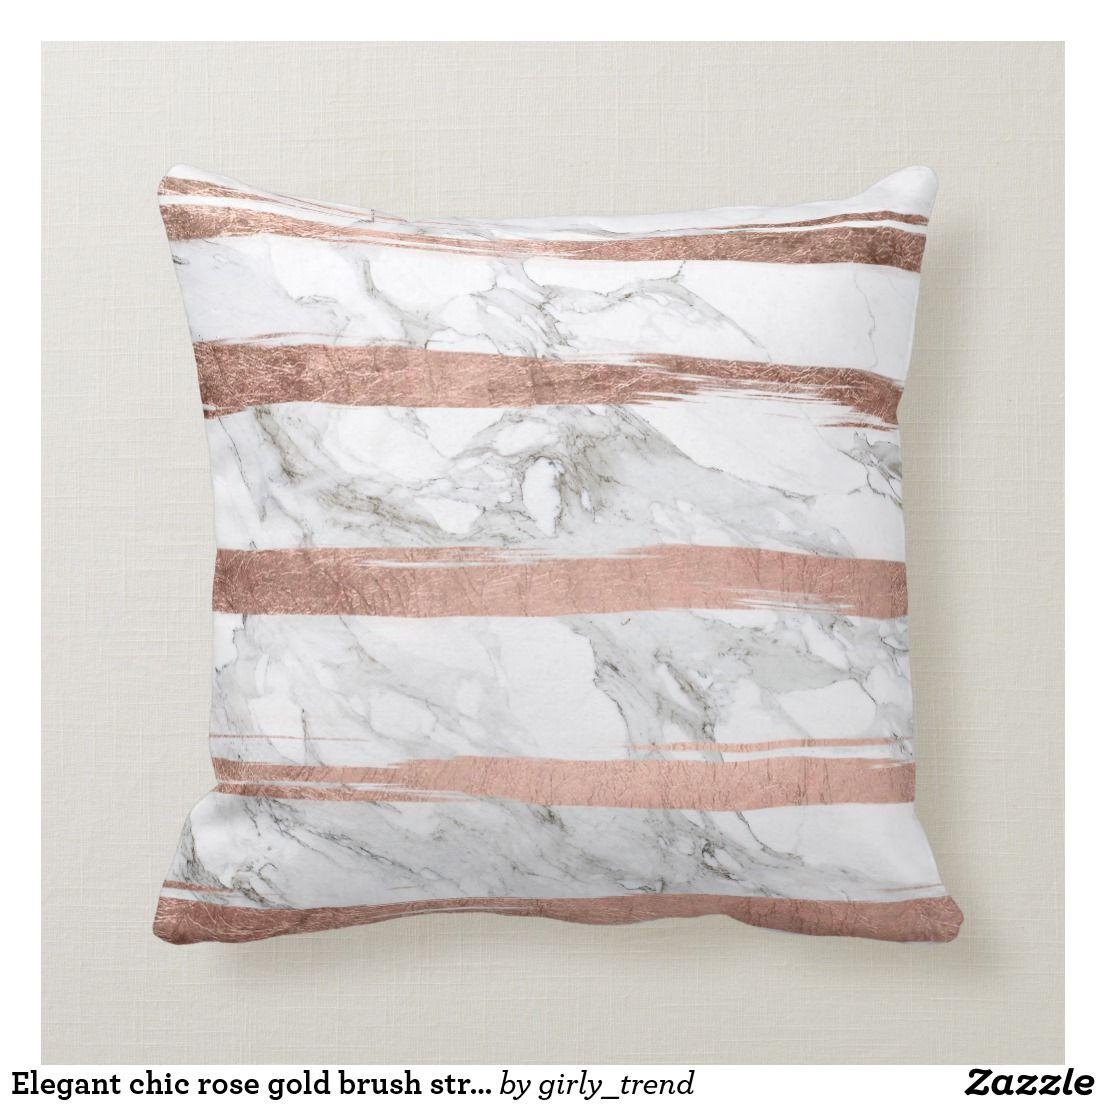 Elegant Chic Rose Gold Brush Stripes White Marble Throw Pillow Zazzle Com Gold Bedroom Decor Rose Gold Brushes Throw Pillows